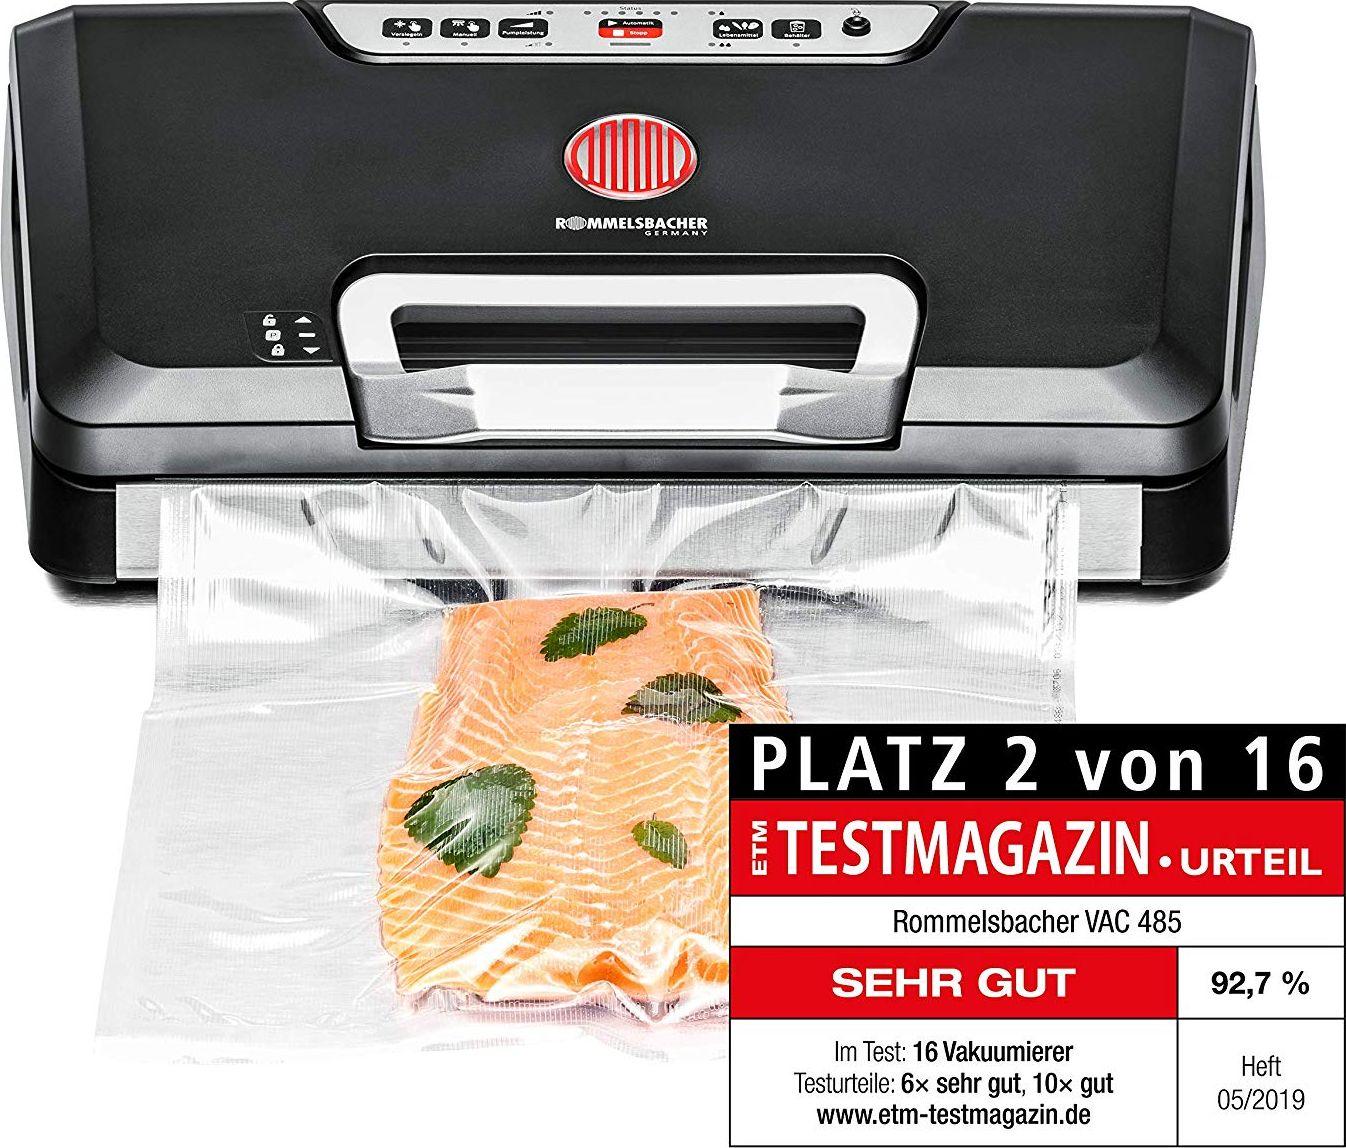 Rommelsbacher VAC vacuum sealer 485(black / silver)